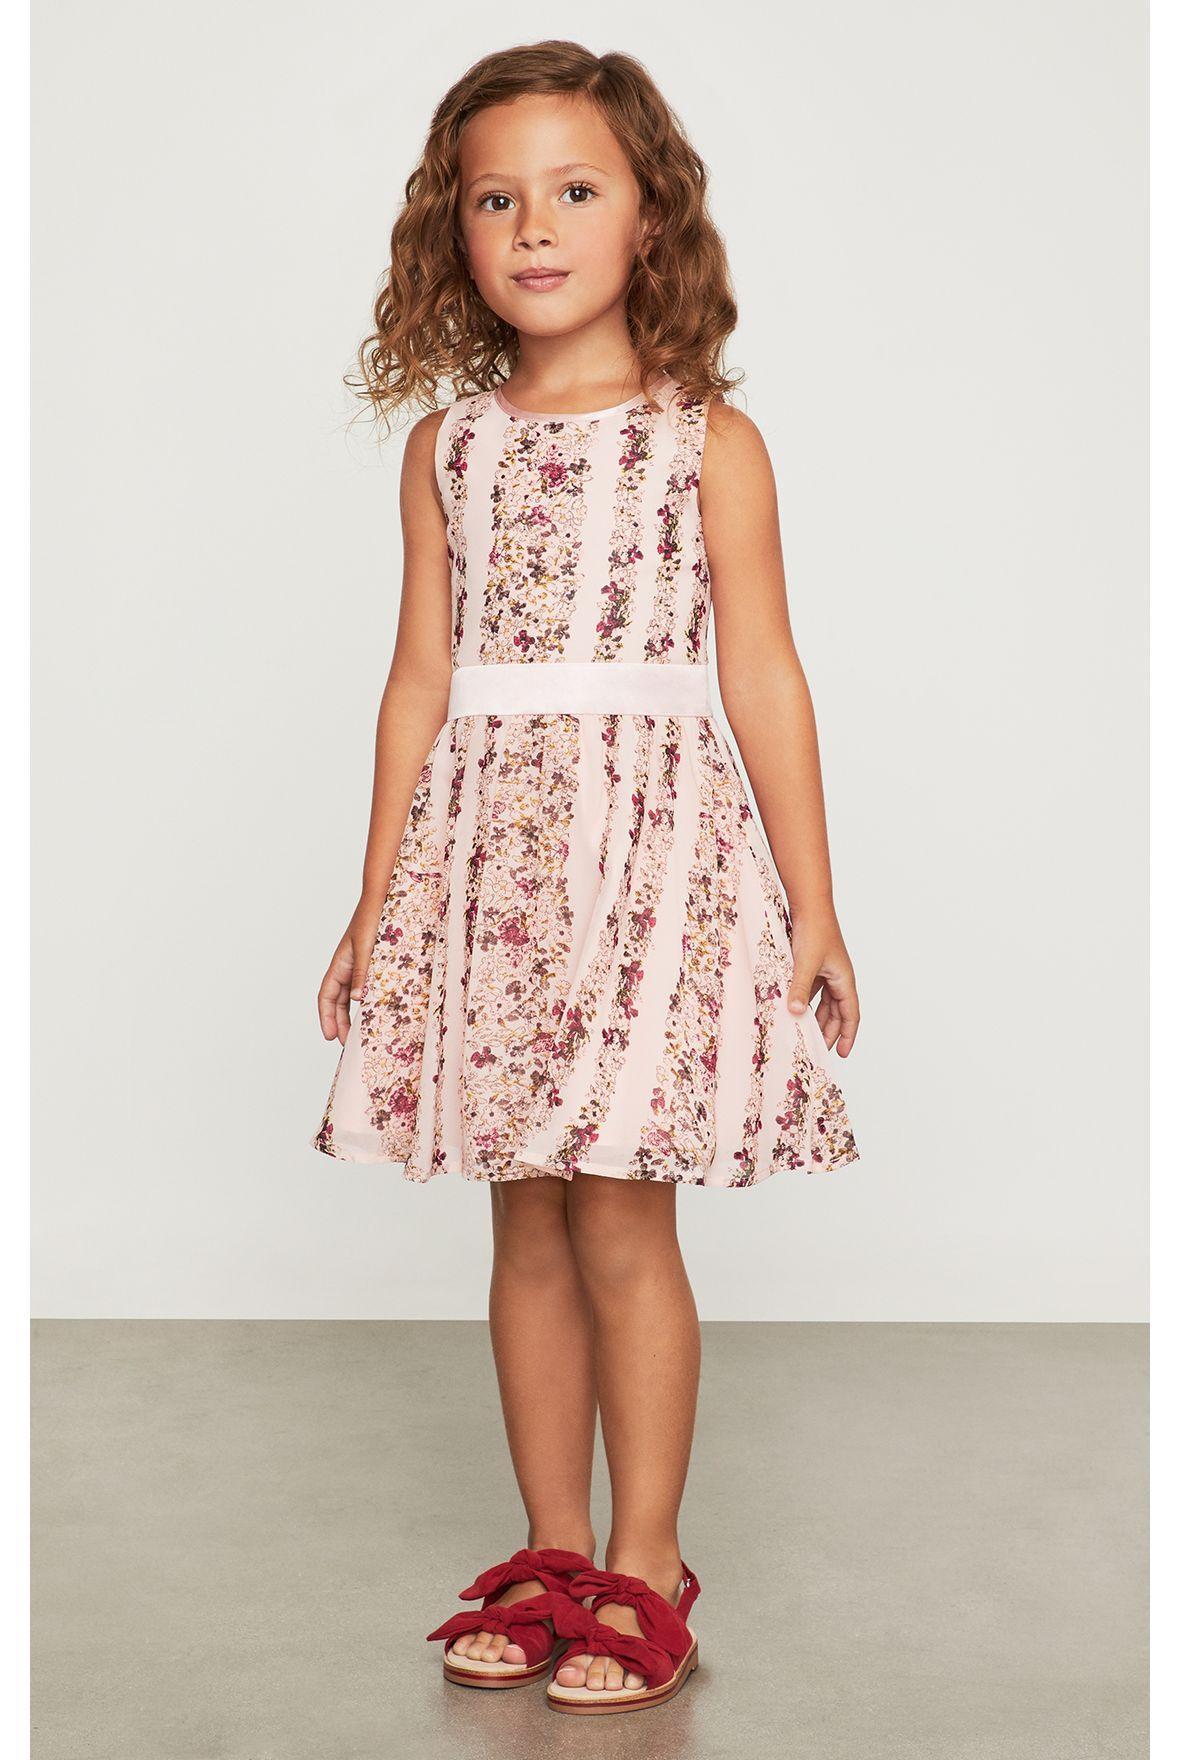 Vestido-BCBGirls-rosa-con-flores-B638DR205_RPL_b